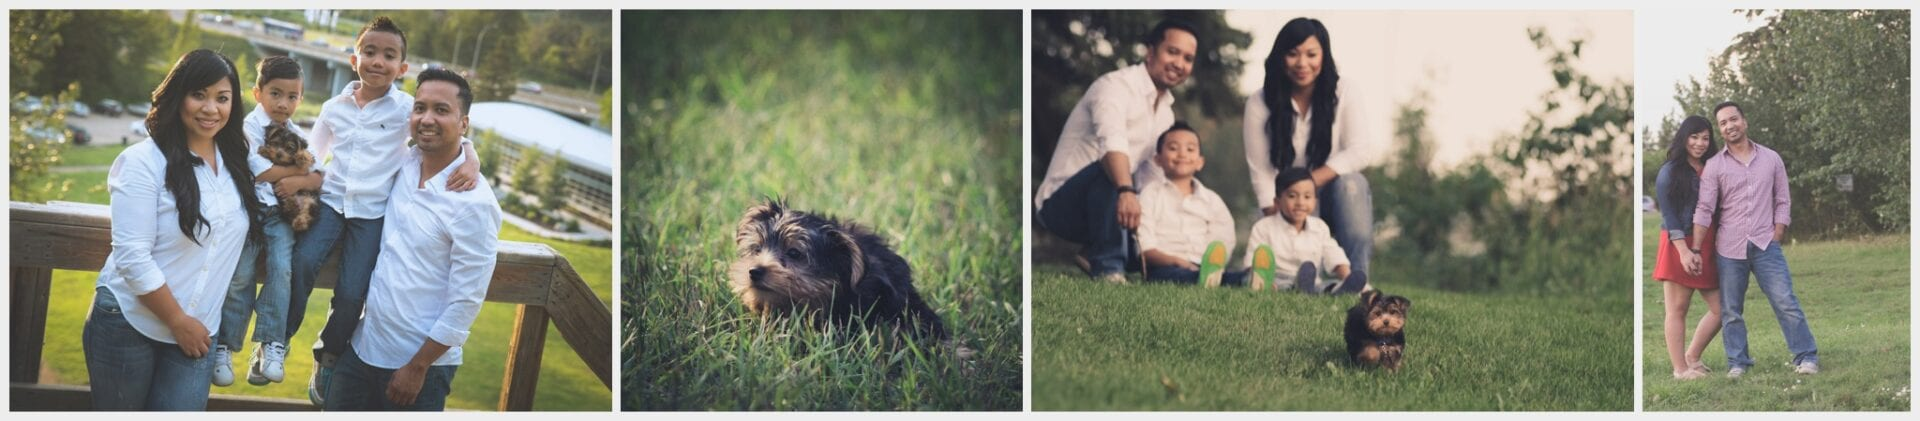 Fox Drive Whitemud Park Edmonton Family Photography Session-_0007